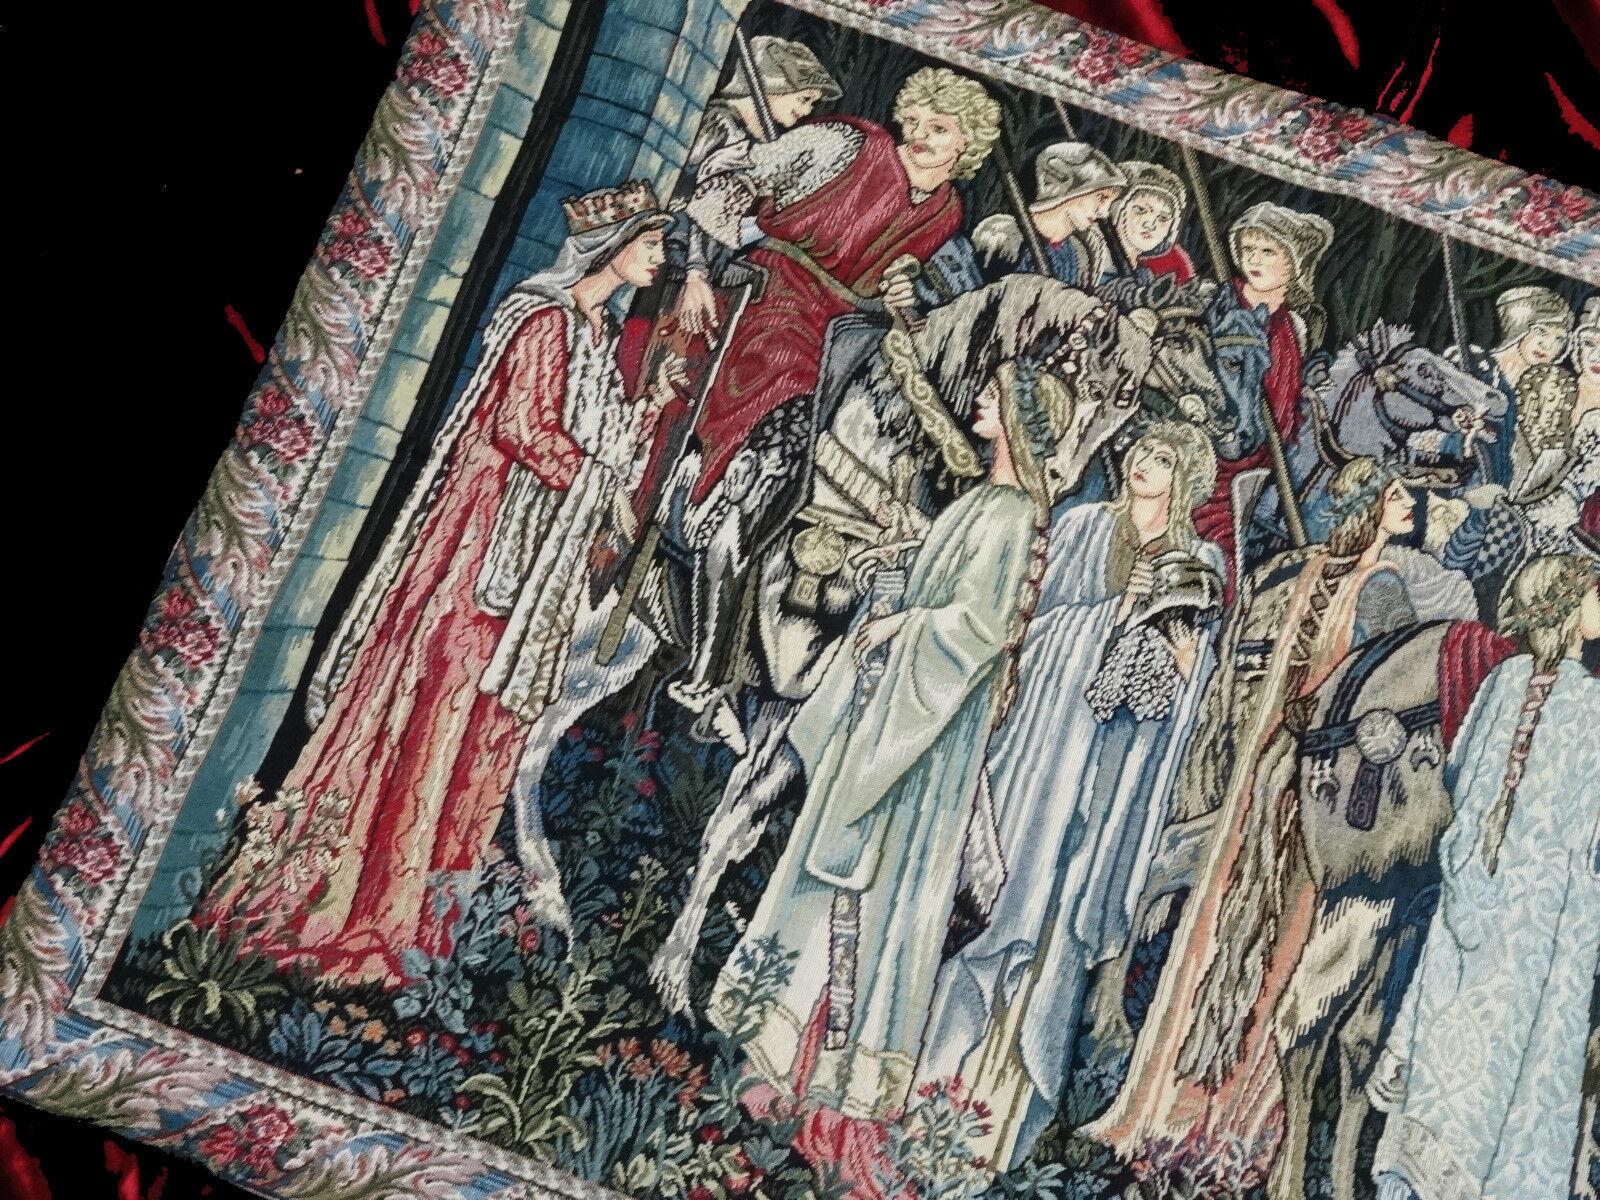 Tapisserie de 95x68 Italy Tapis Warrior Corteo arazzo Tapisserie croisés 95x68 de aaa092